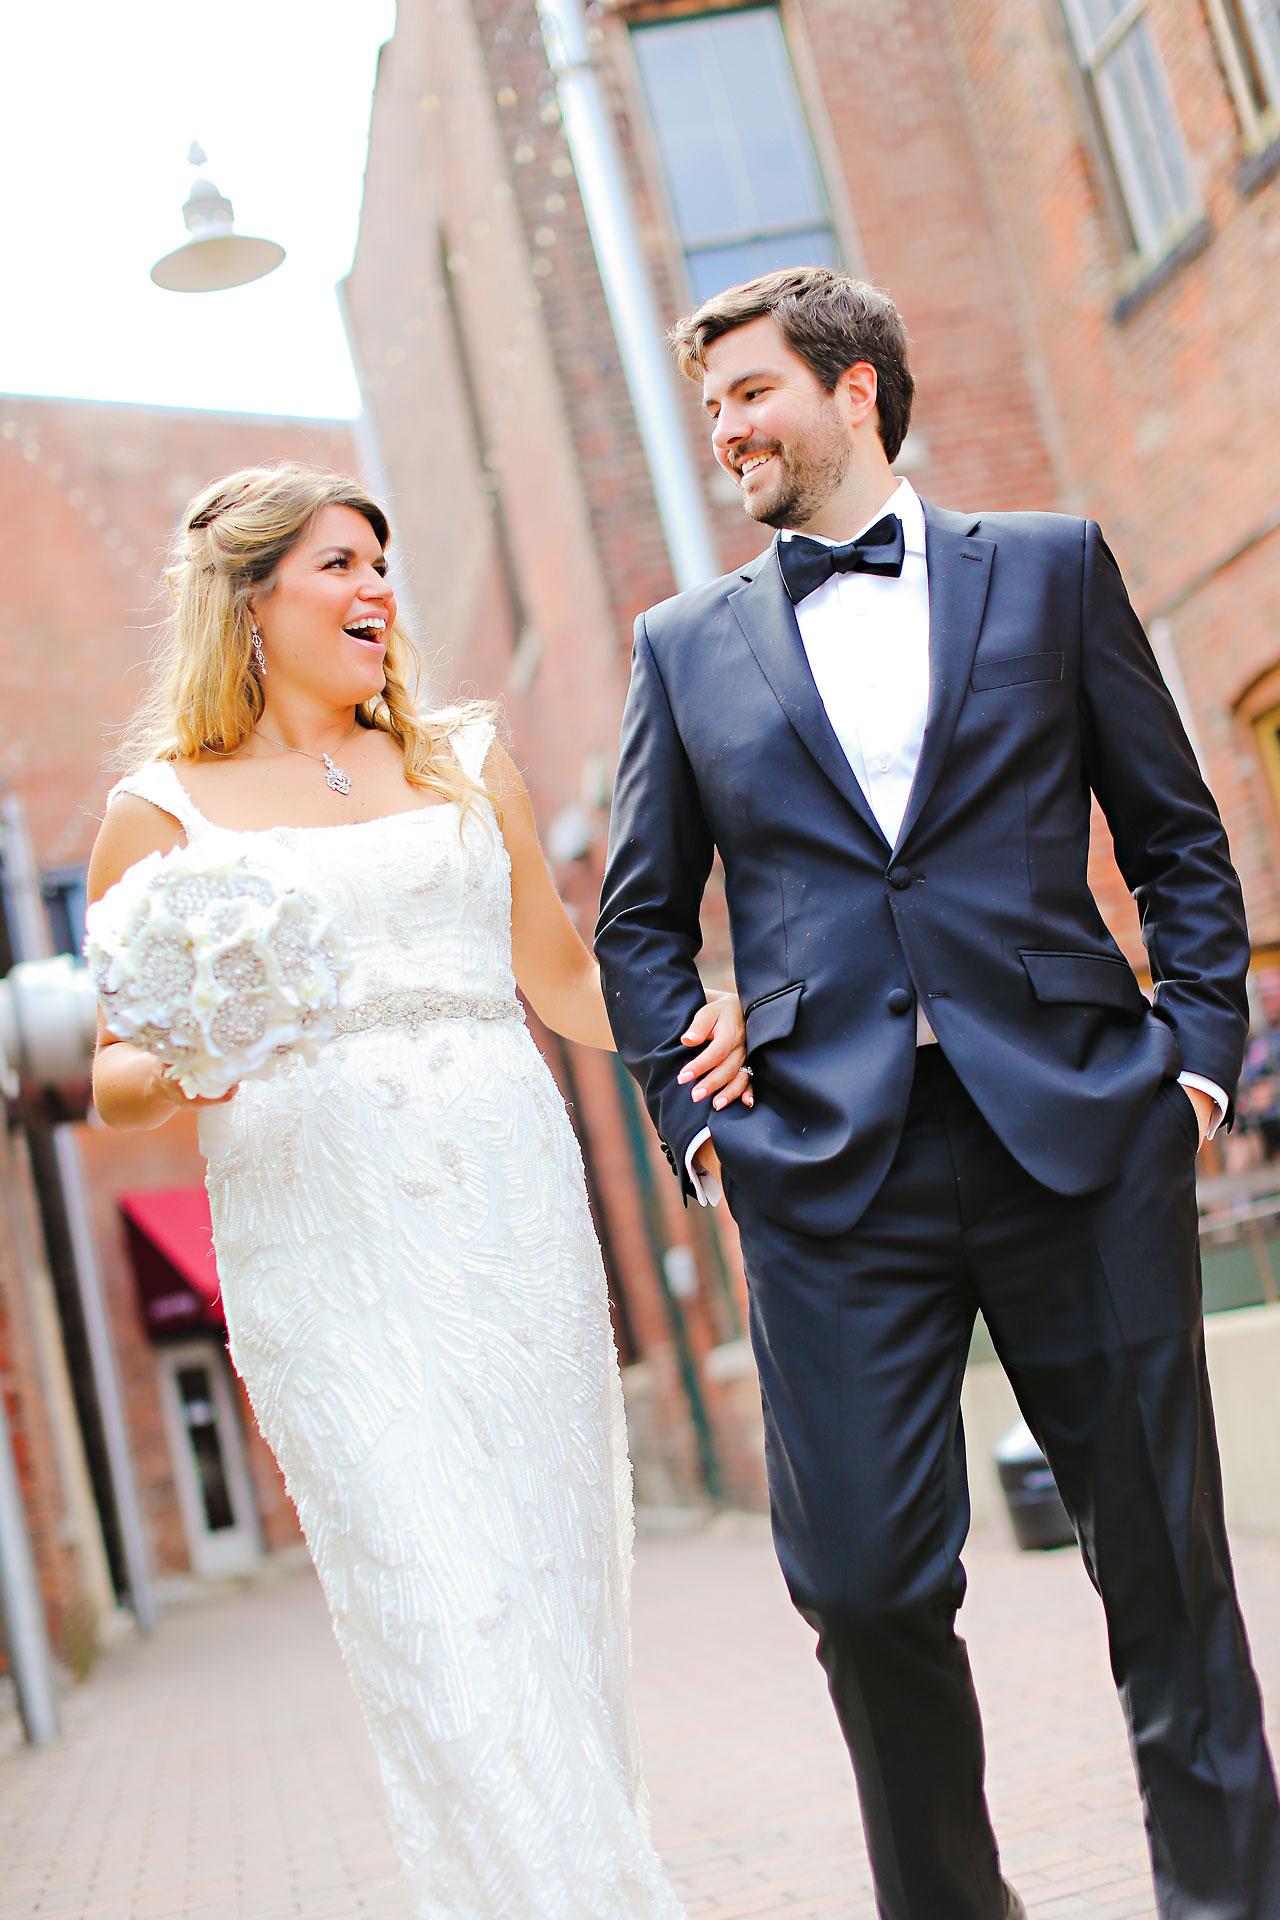 Amy Nick Canal 337 Wedding 123